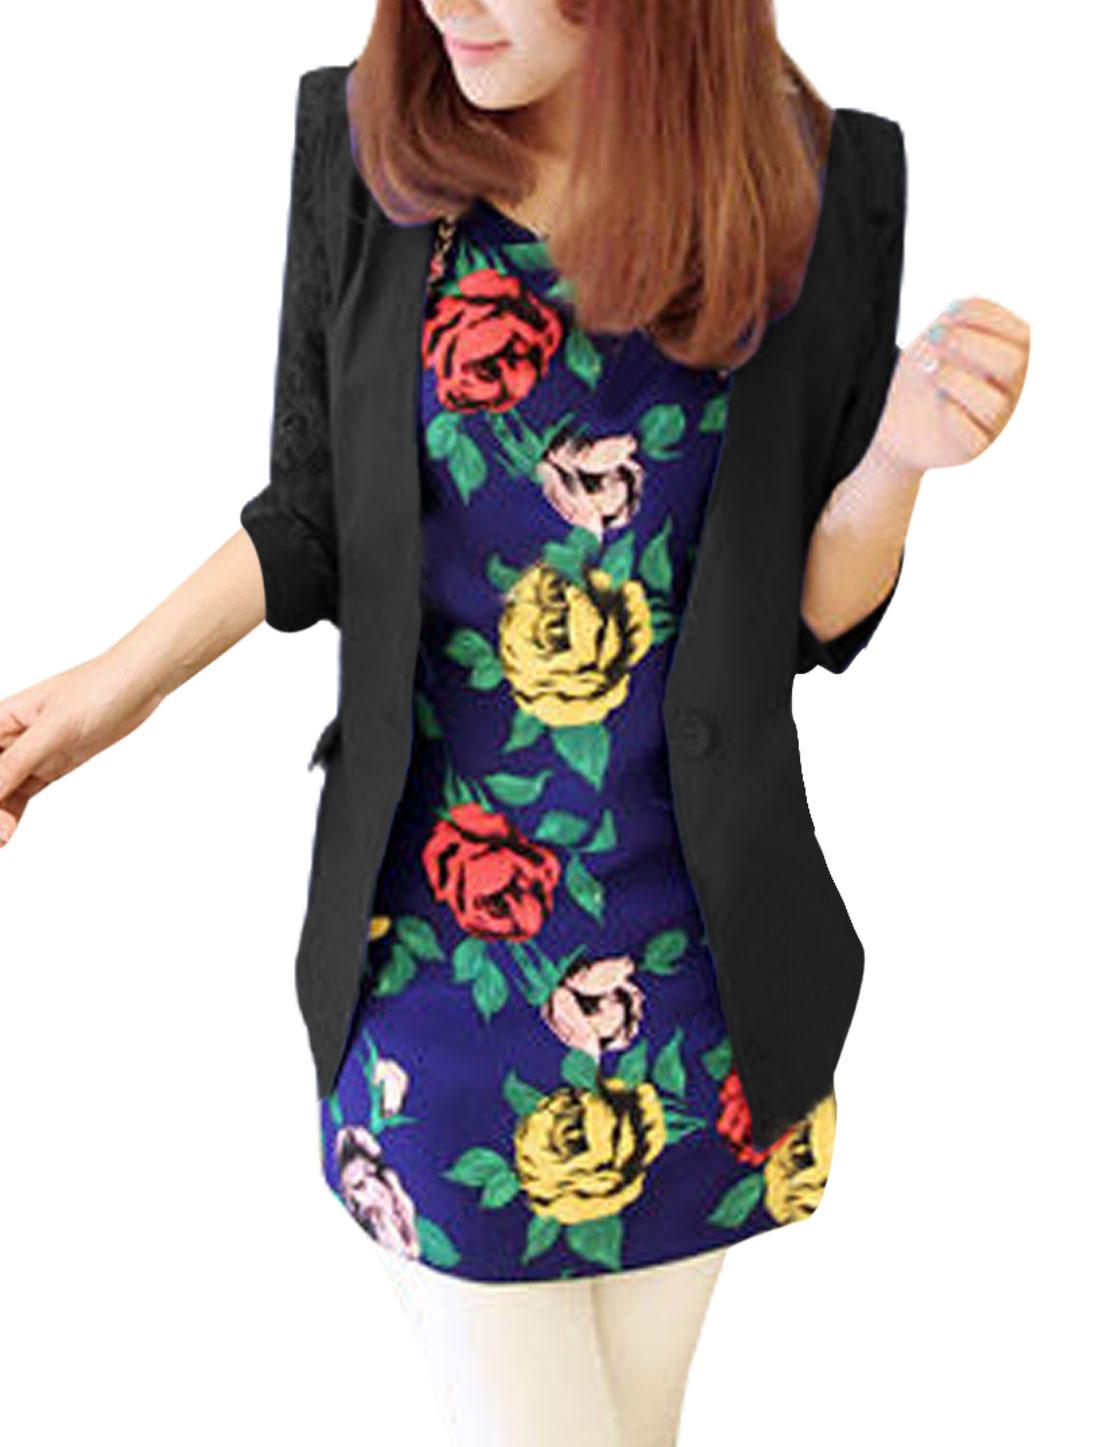 Ladies Button Closure 3/4 Sleeves Lace Panel Blazer Black XS